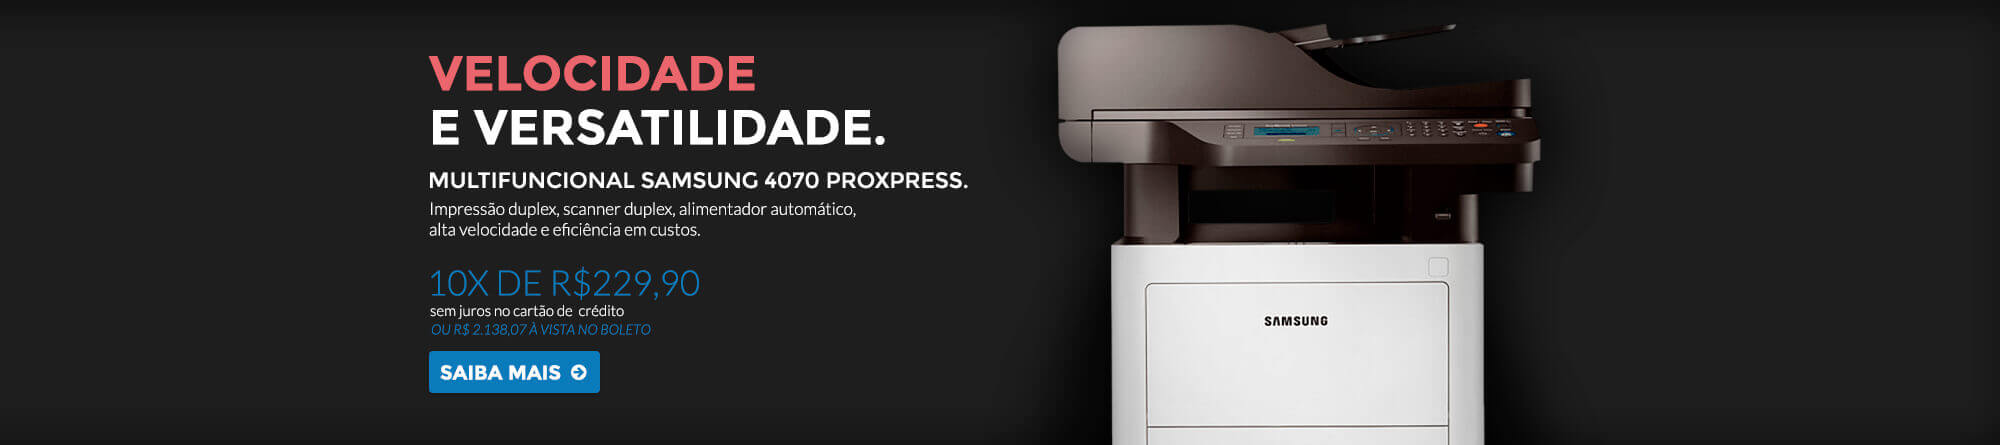 Samsung 4070